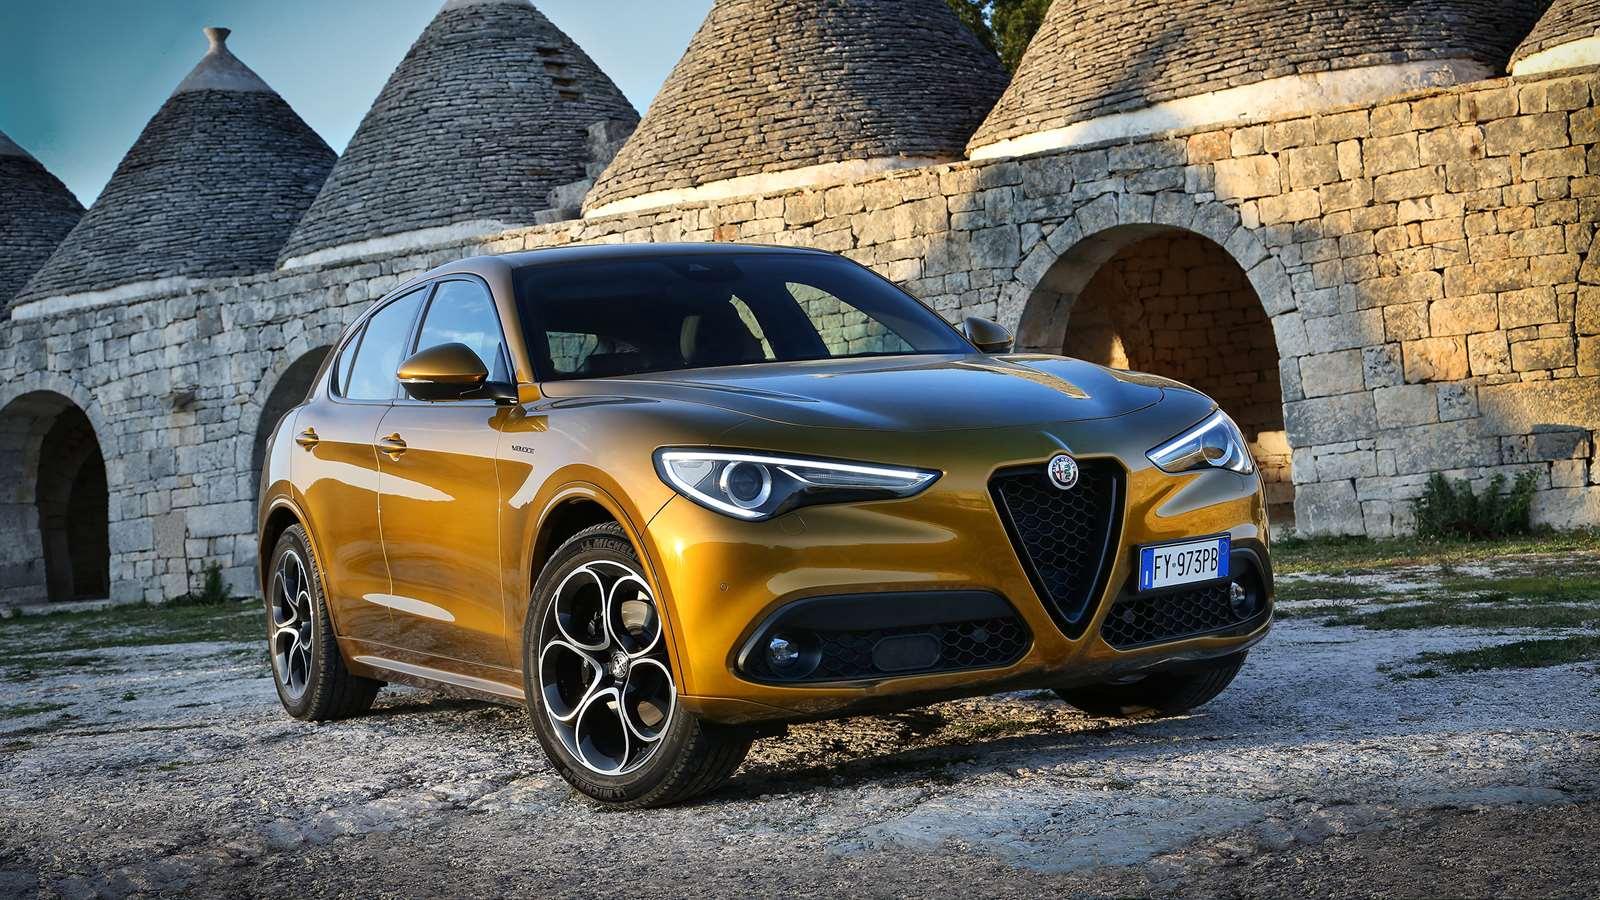 [Review] Alfa Romeo Stelvio | GRR